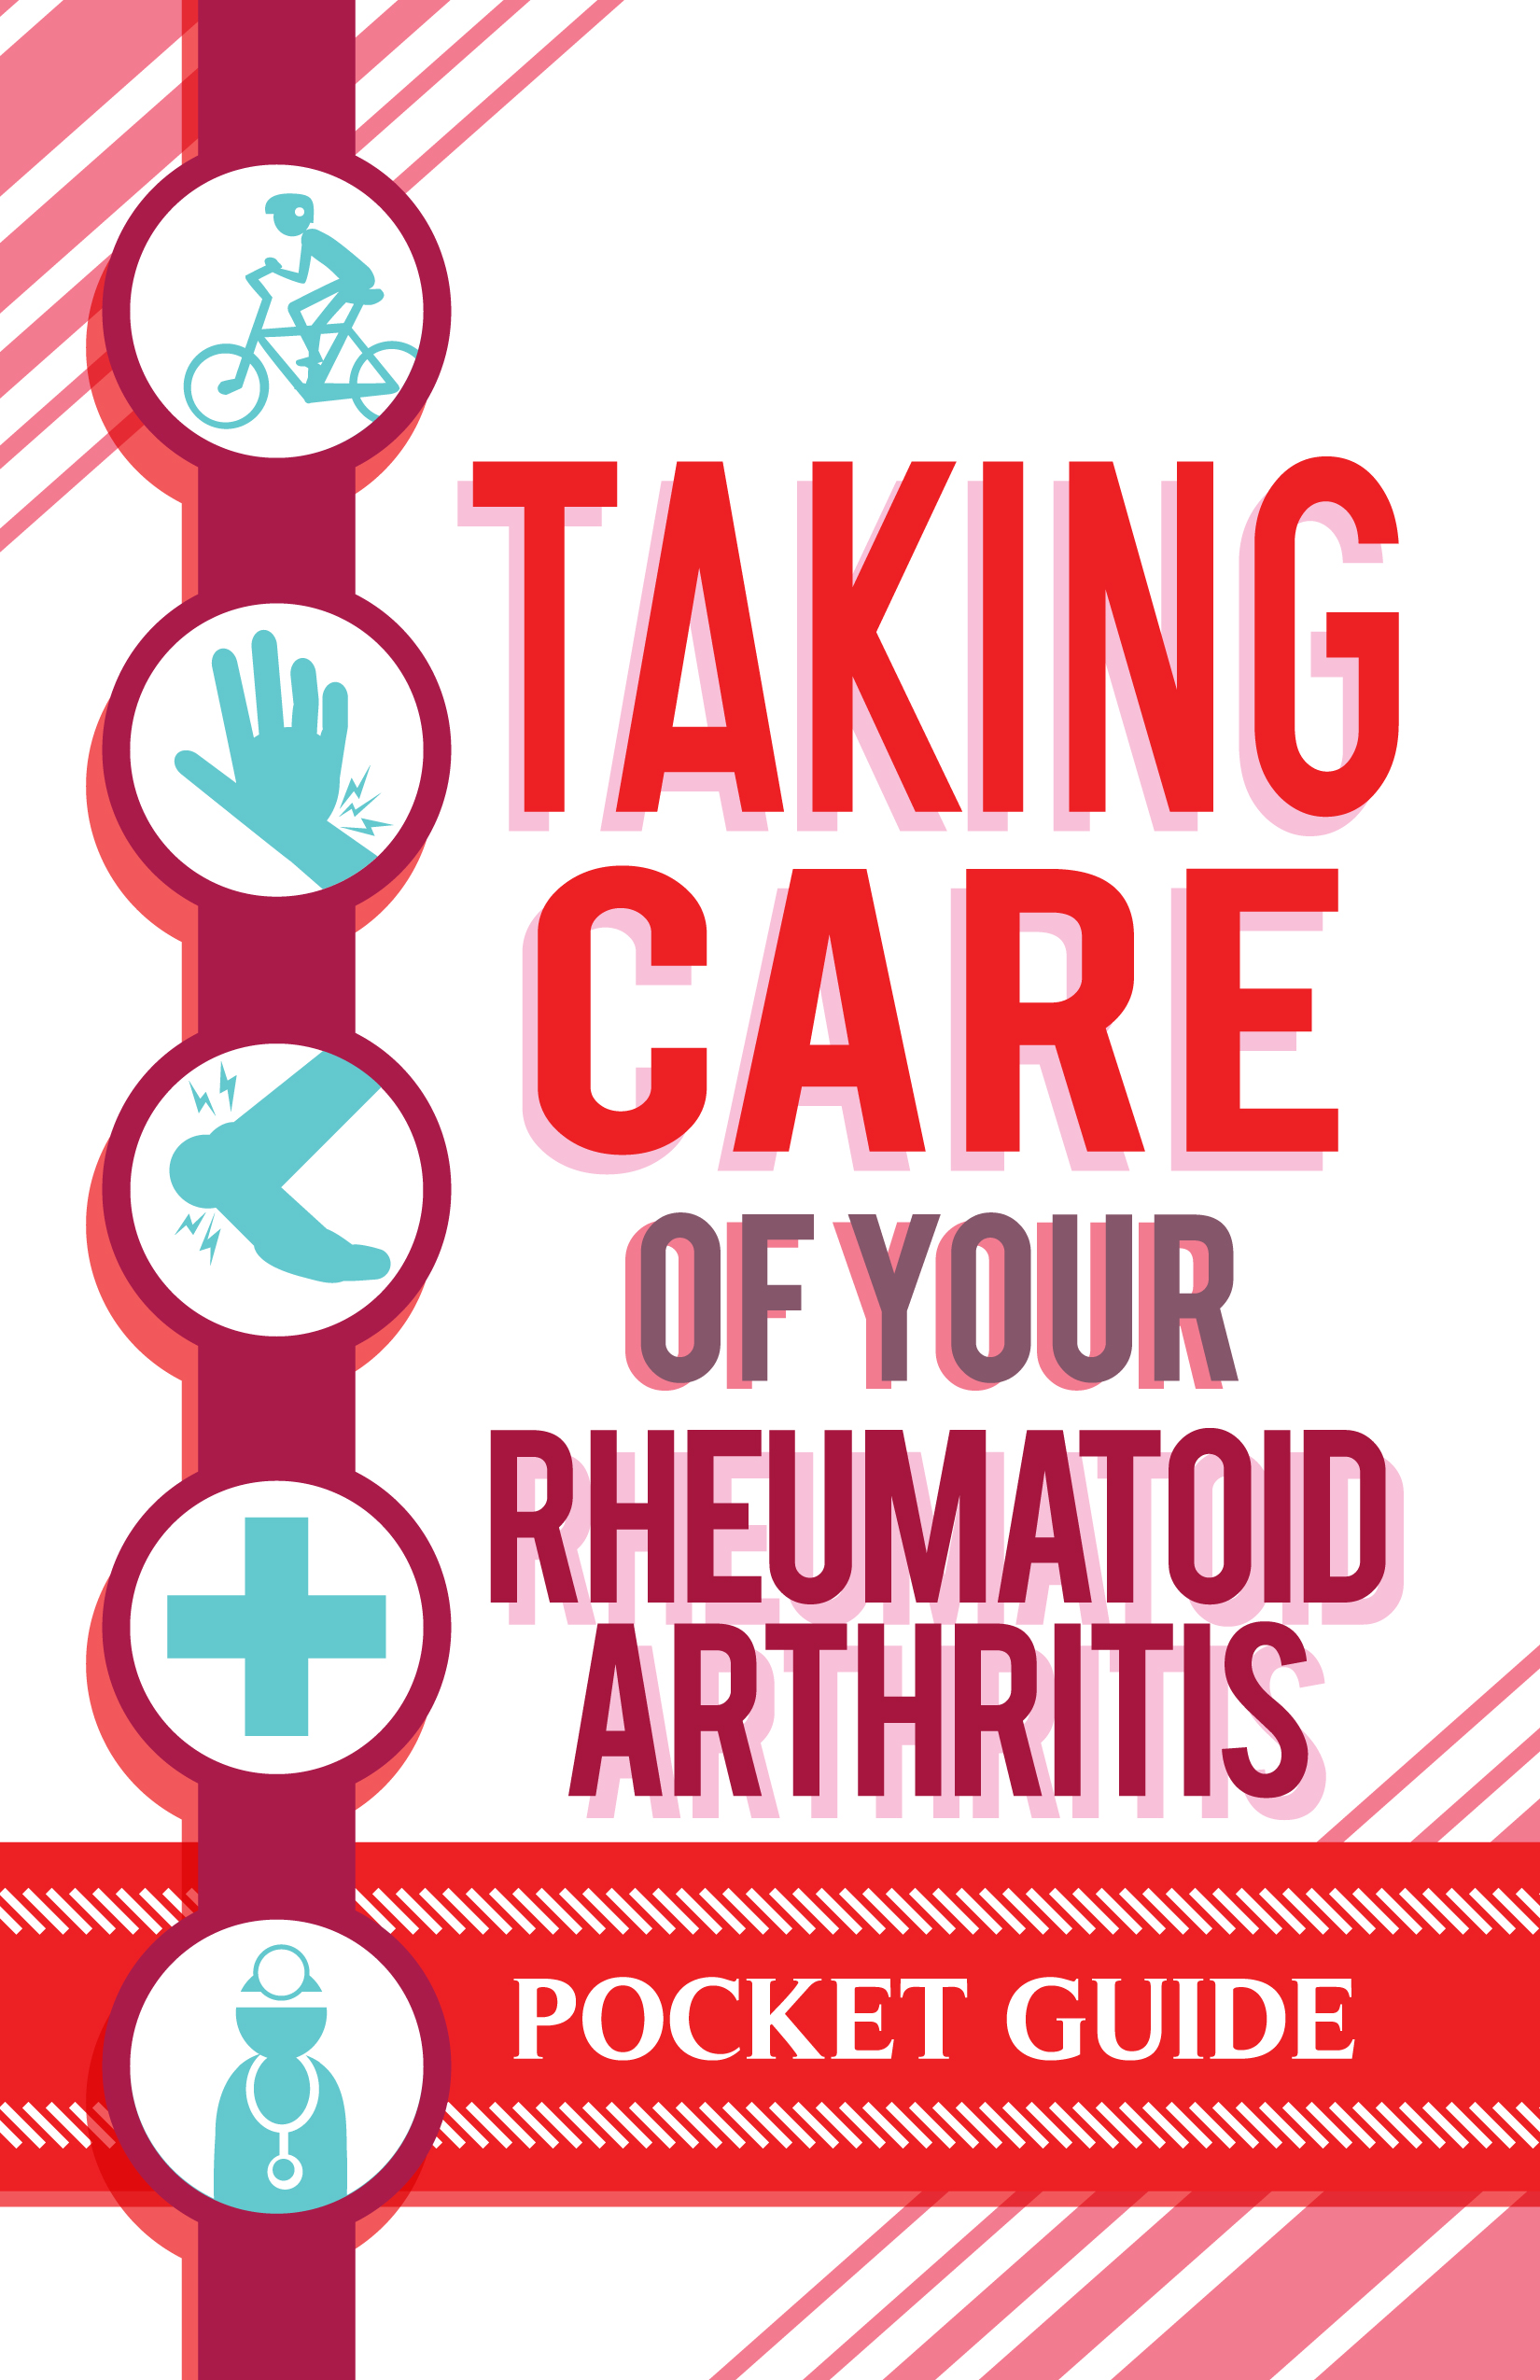 TAKING CARE OF YOUR RHEUMATOID ARTHRITIS: